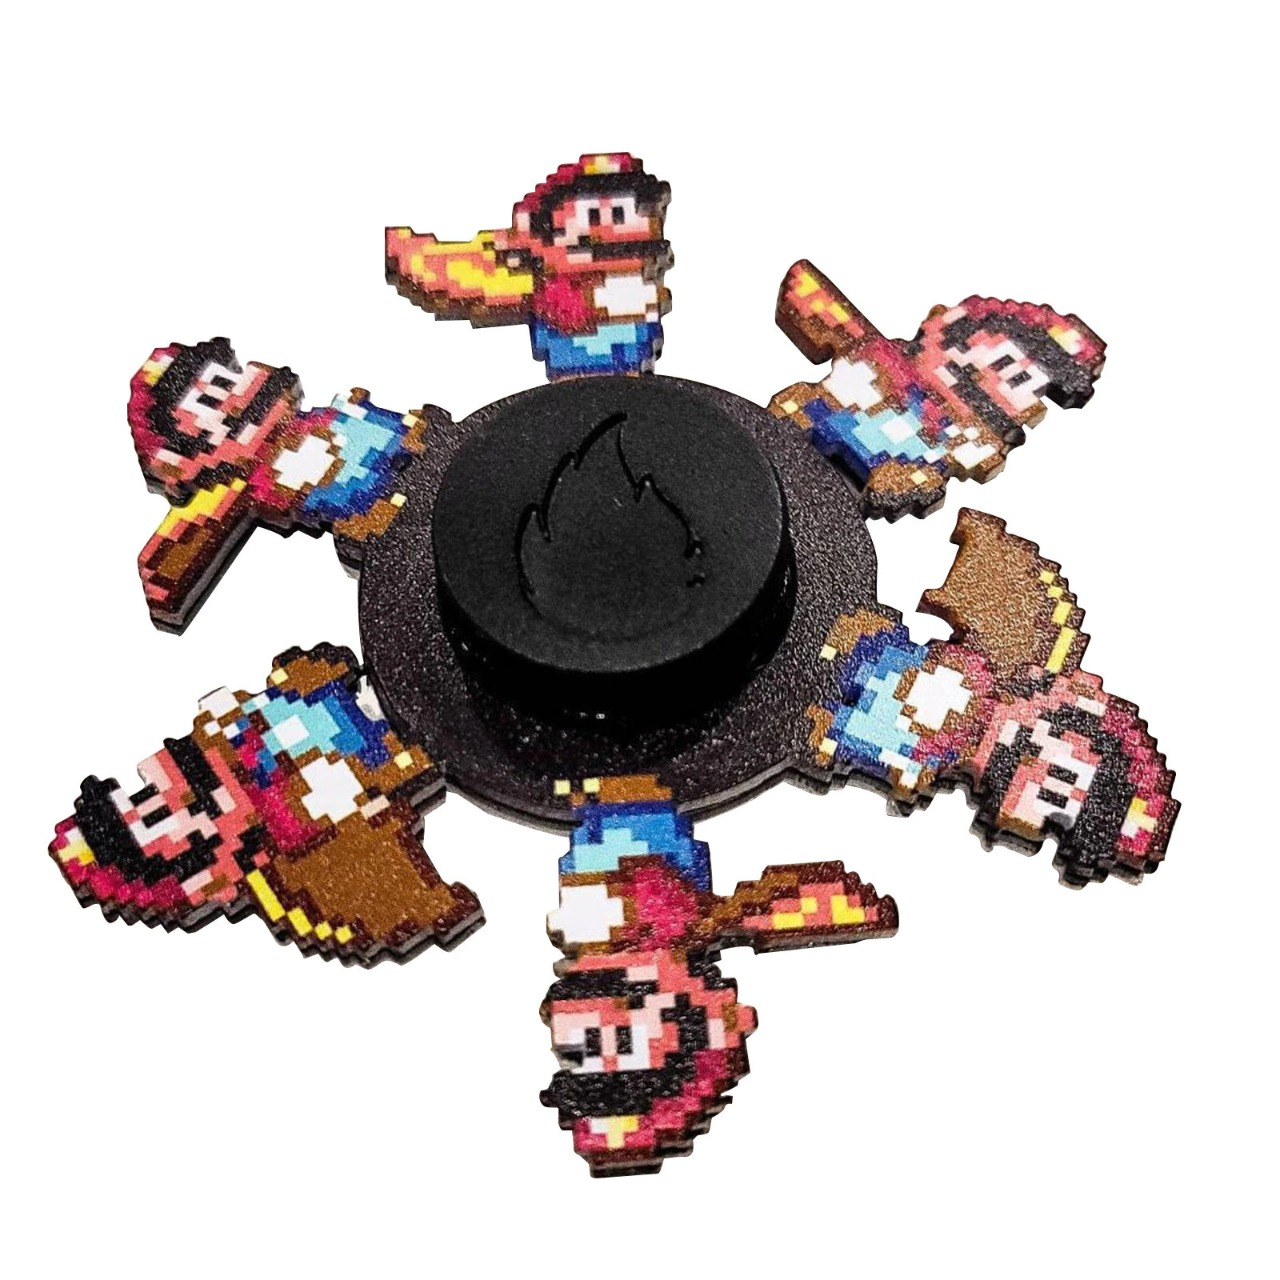 Hand Spinner Motion  Mario: Super Mario World - Rolamento Anti Estresse Fidget Hand Spinner - EVALI